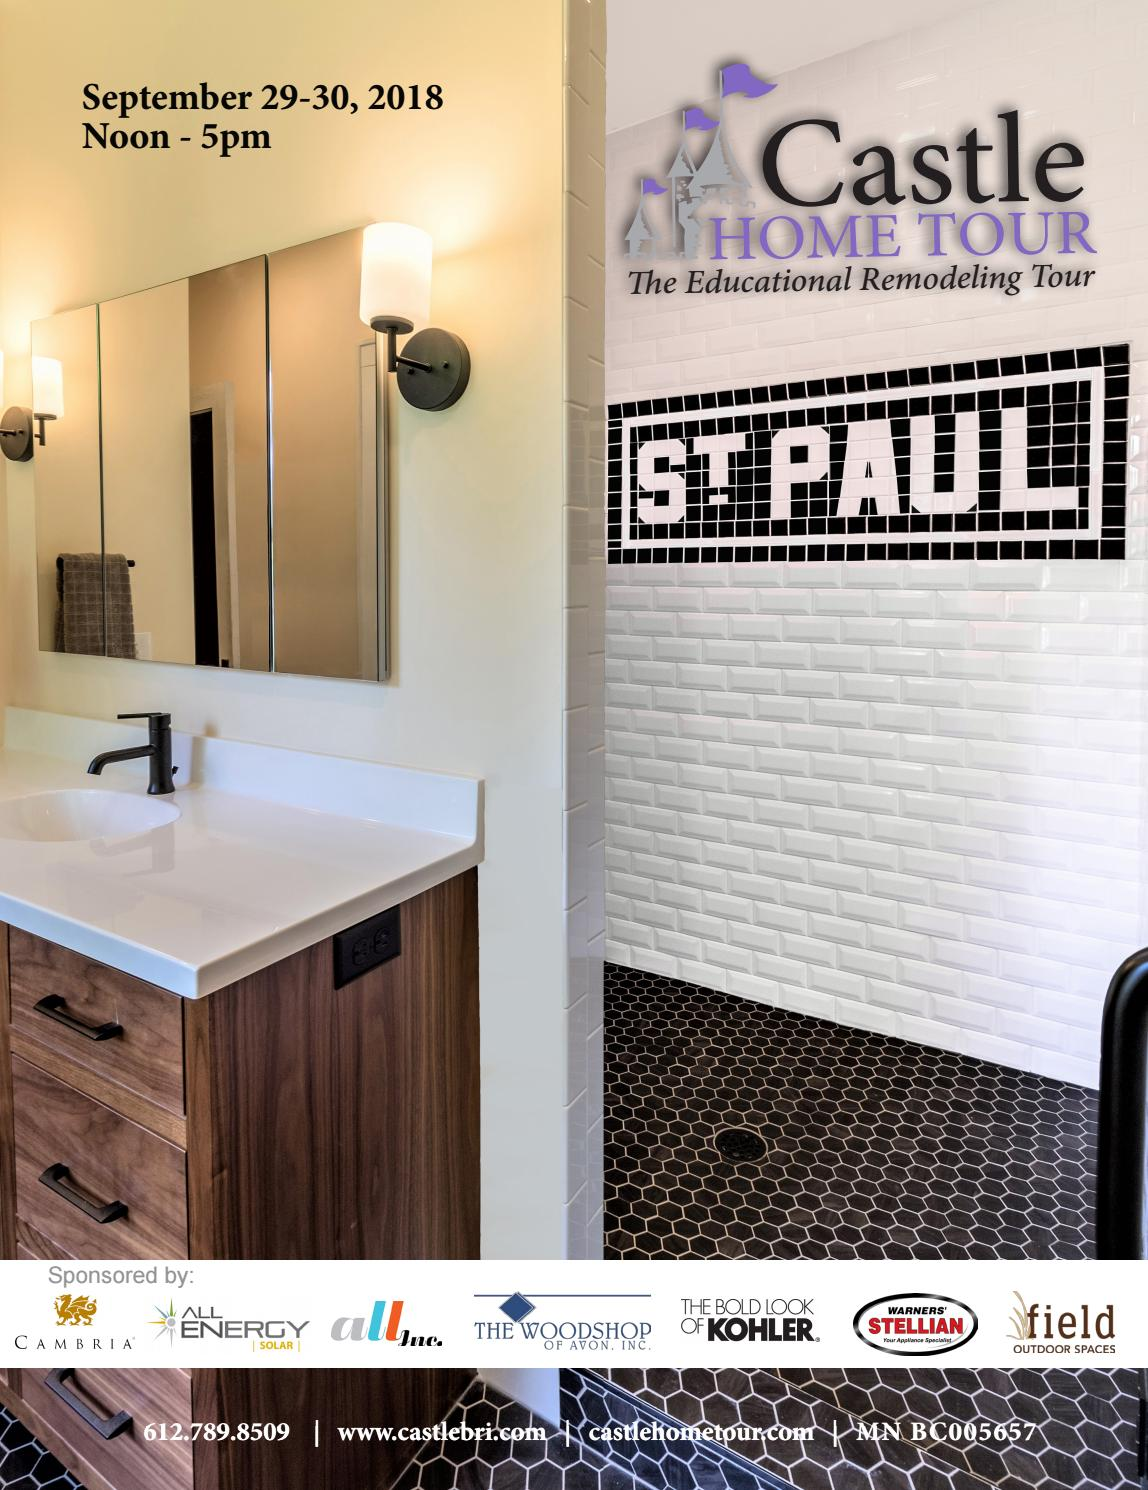 2018 Castle Home Tour Guidebook By Castlebri Issuu Kitchen Faucet Parts Additionally Kohler K 6331 List And Diagram